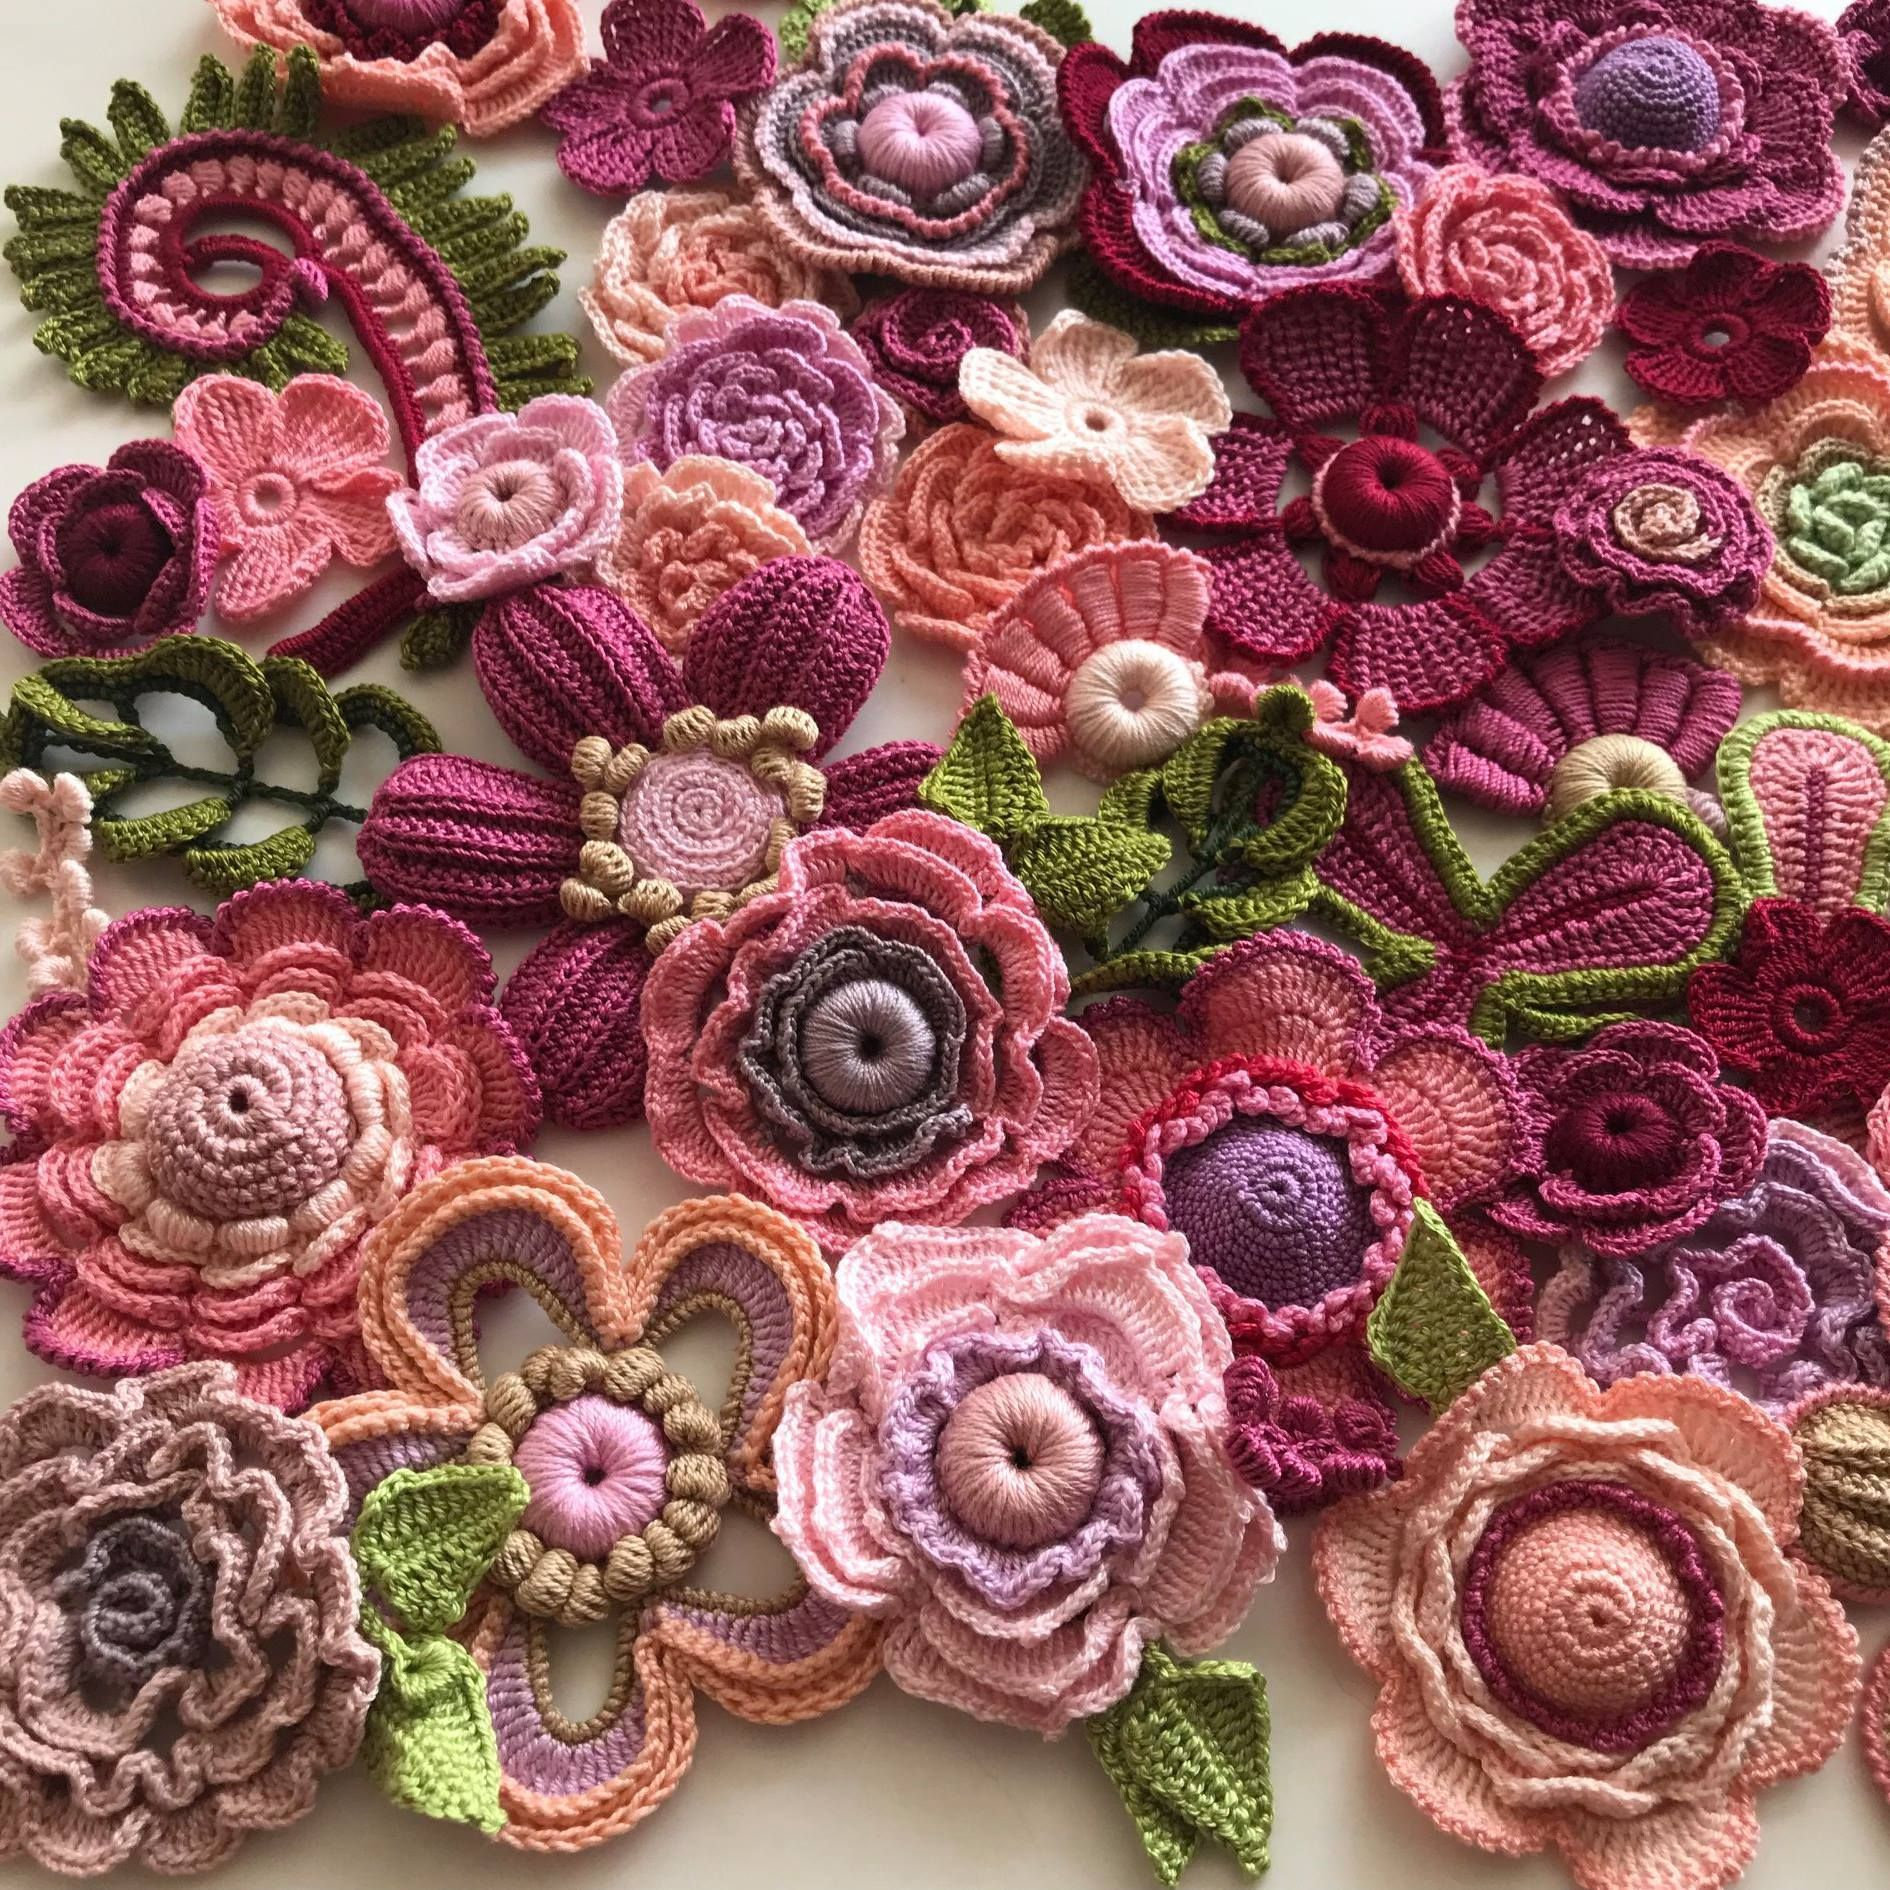 Best 12 Easy and cute free crochet flowers pattern image ideas for new season 2019 page 2 of 36 – Artofit #irishcrochetflowers